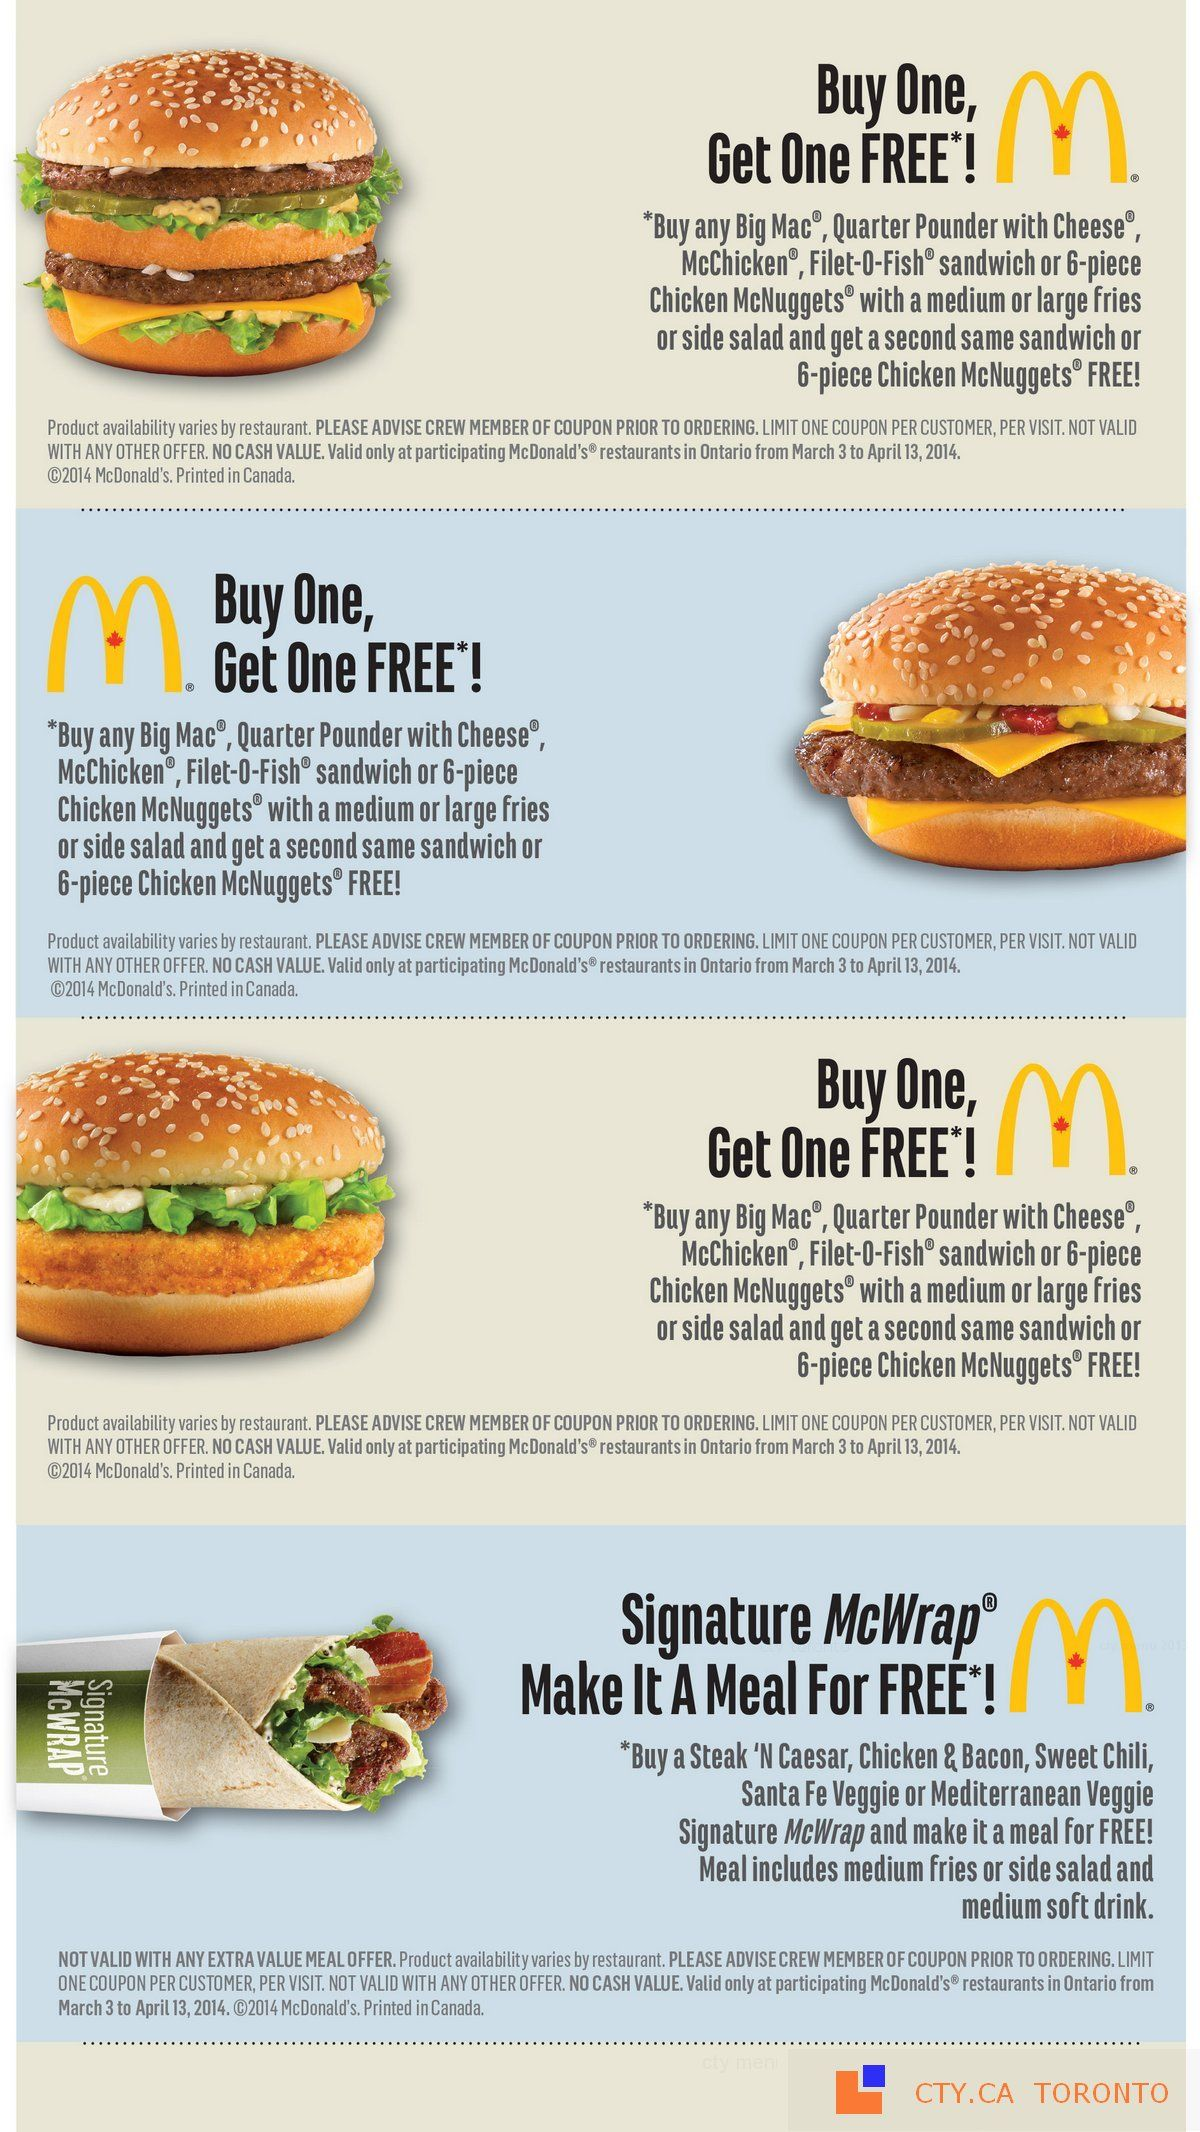 mcdonald s coupons march 3 april 13 2014 restaurant